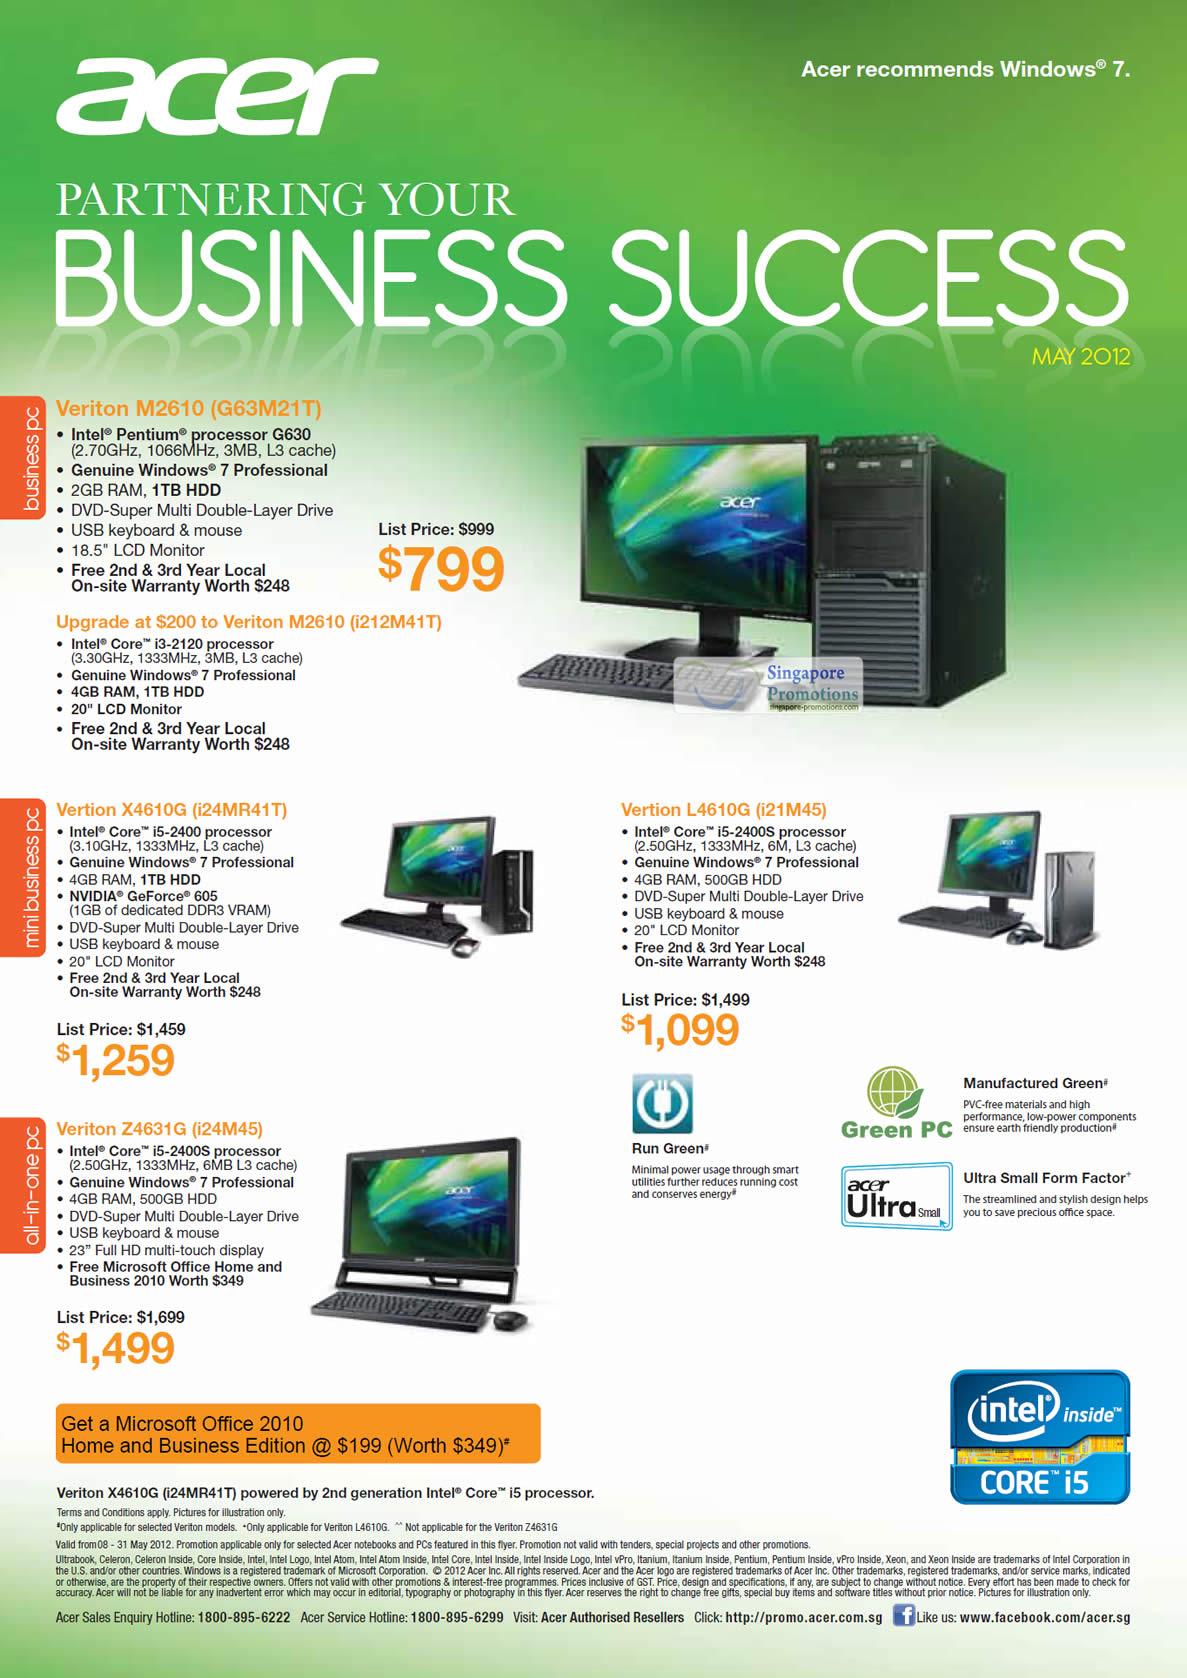 Acer Veriton M2610 G63M21T Desktop PC, Acer Veriton M2610 i212M41T Desktop PC, Acer Vertion X4610G i24MR41T Desktop PC, Acer Vertion L4610G i21M45 Desktop PC, Acer Veriton Z4631G i24M45 AIO Desktop PC